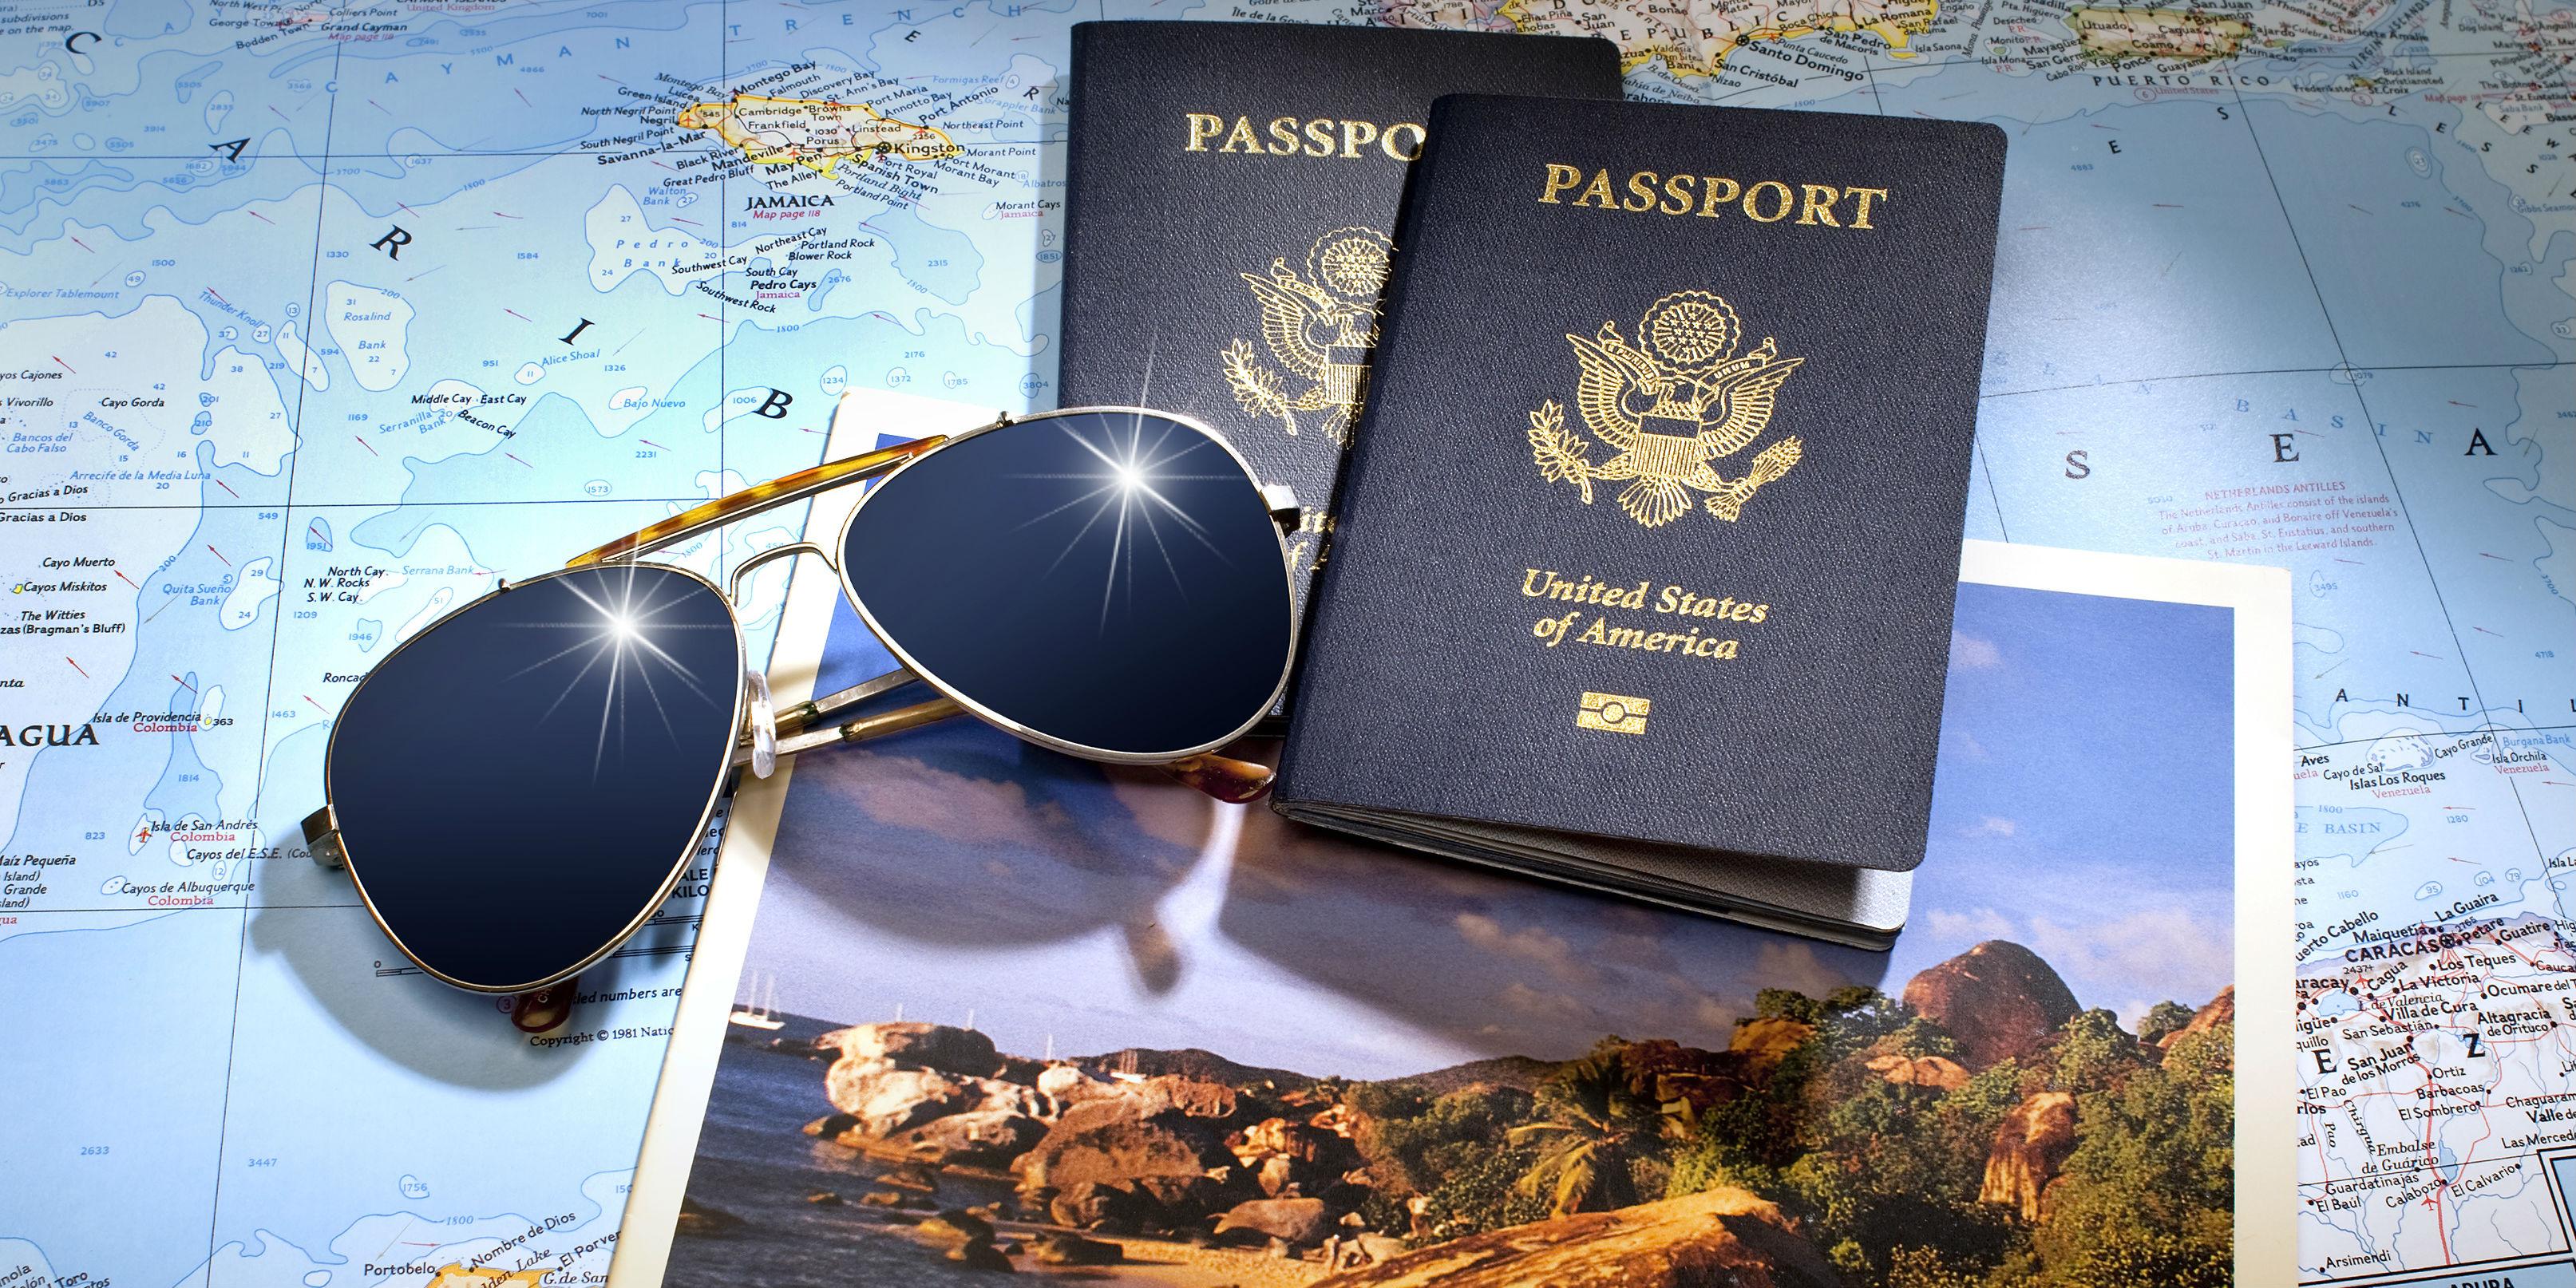 Puerto Rico Passport Requirements